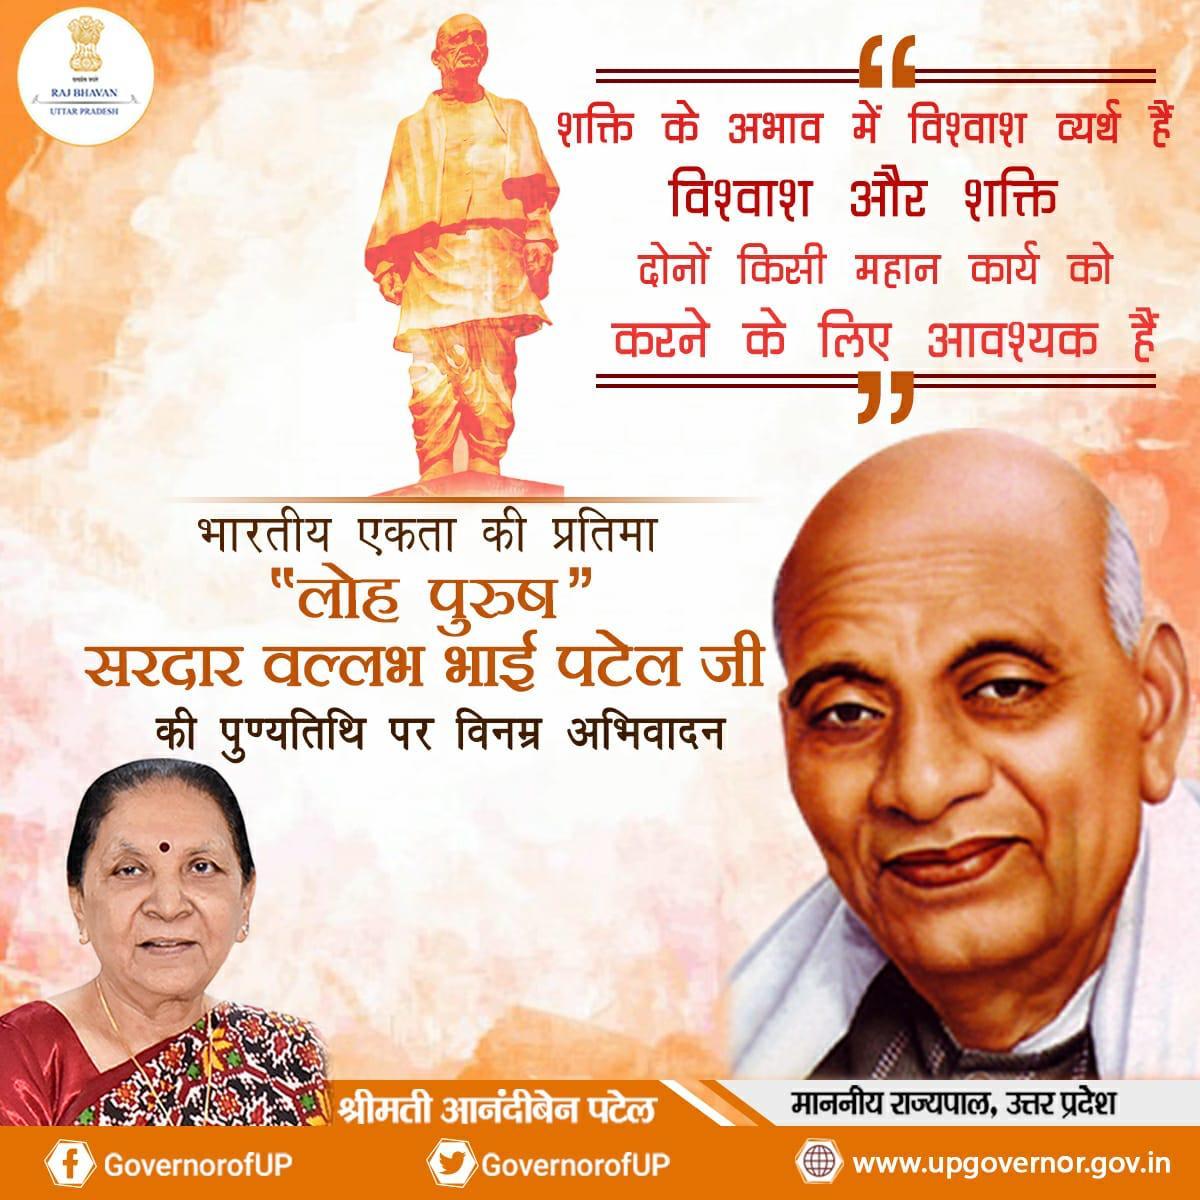 "भारतीय एकता की प्रतिमा ""लौह पुरुष"" श्री सरदार वल्लभभाई पटेलजी की पुण्यतिथि पर कोटि कोटि अभिवादन...नमन... #SardarVallabhbhaiPatel #SardarPatel  #StatueOfUnity https://t.co/6OTTzadzsl"